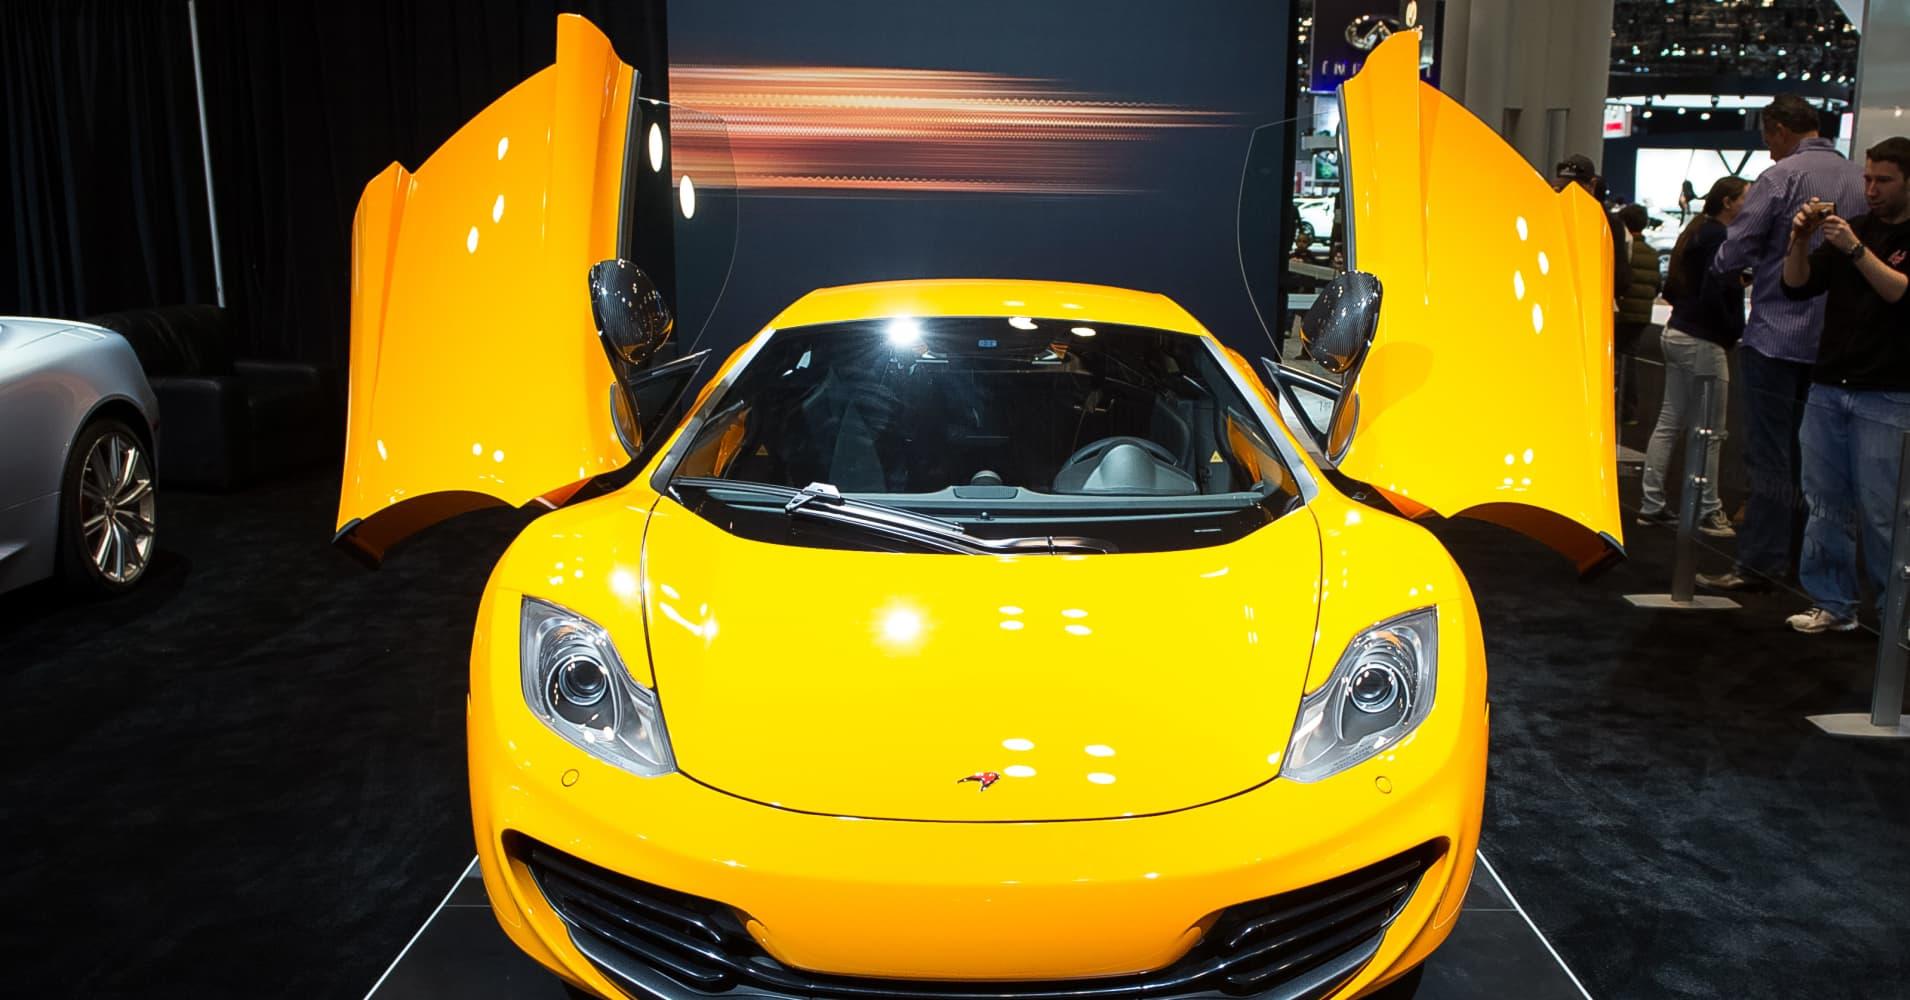 Apple in talks with luxury carmaker McLaren